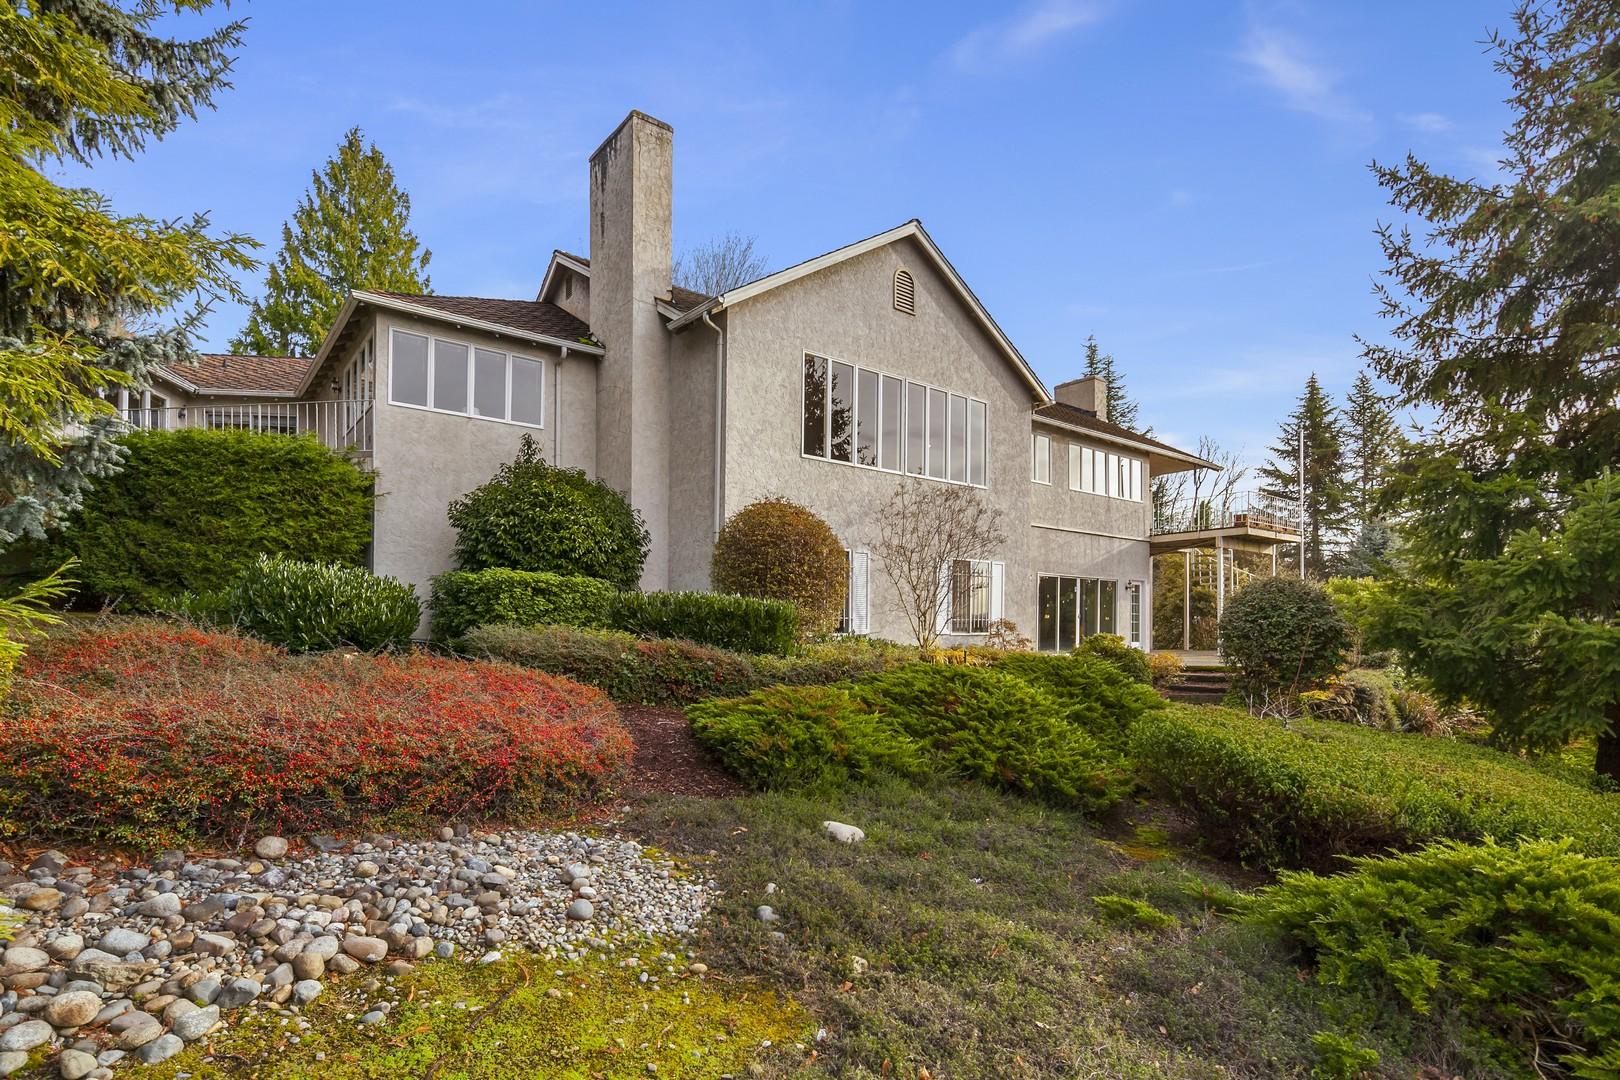 Single Family Home for Sale at 8121 SE 44th St Mercer Island, Washington, 98040 United States